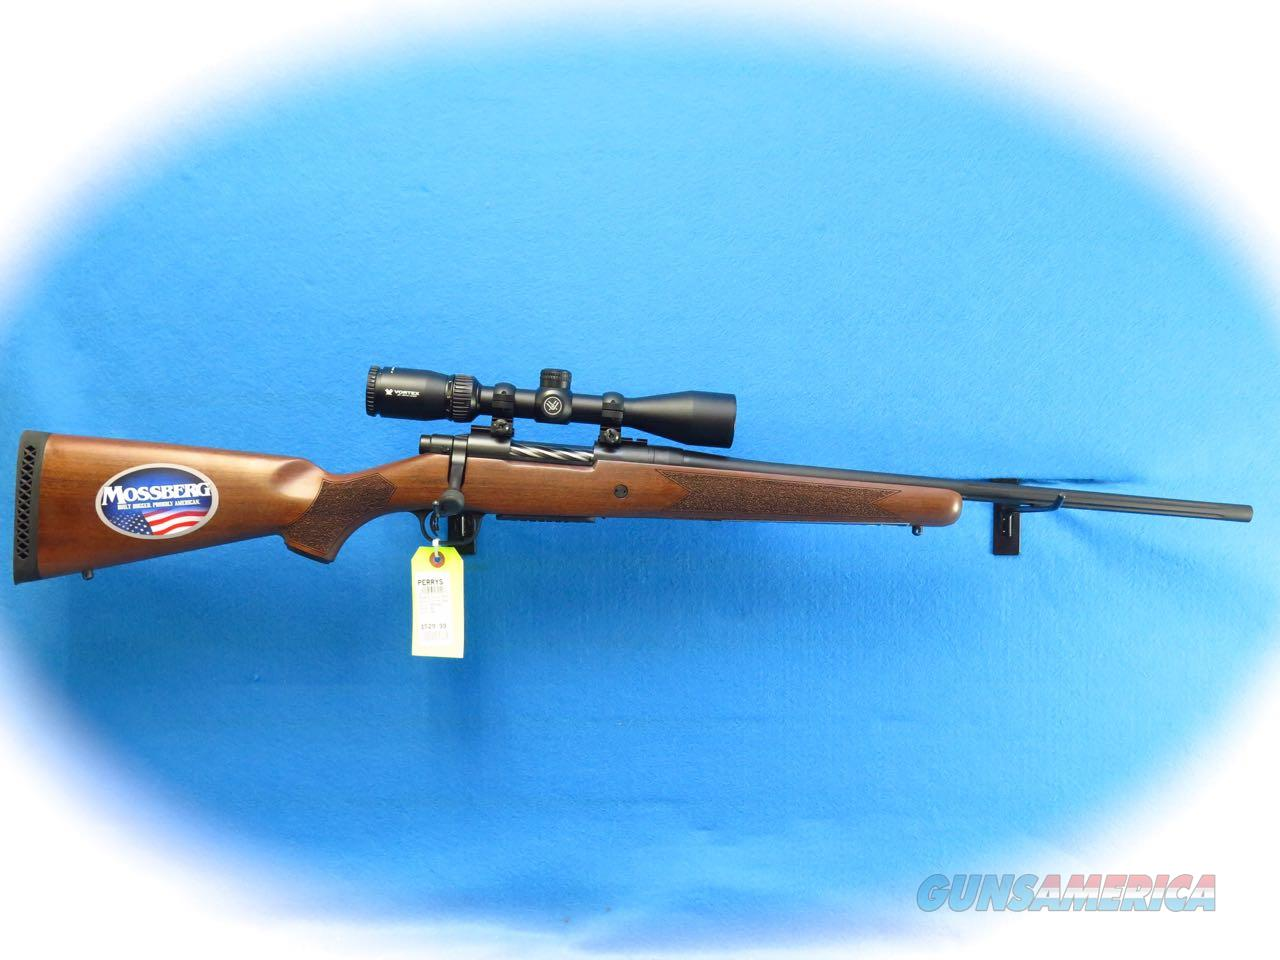 Mossberg Patriot Walnut Bolt Action .308 Win Rifle/Scope Pkg SKU  27940 **New**  Guns > Rifles > Mossberg Rifles > Other Bolt Action